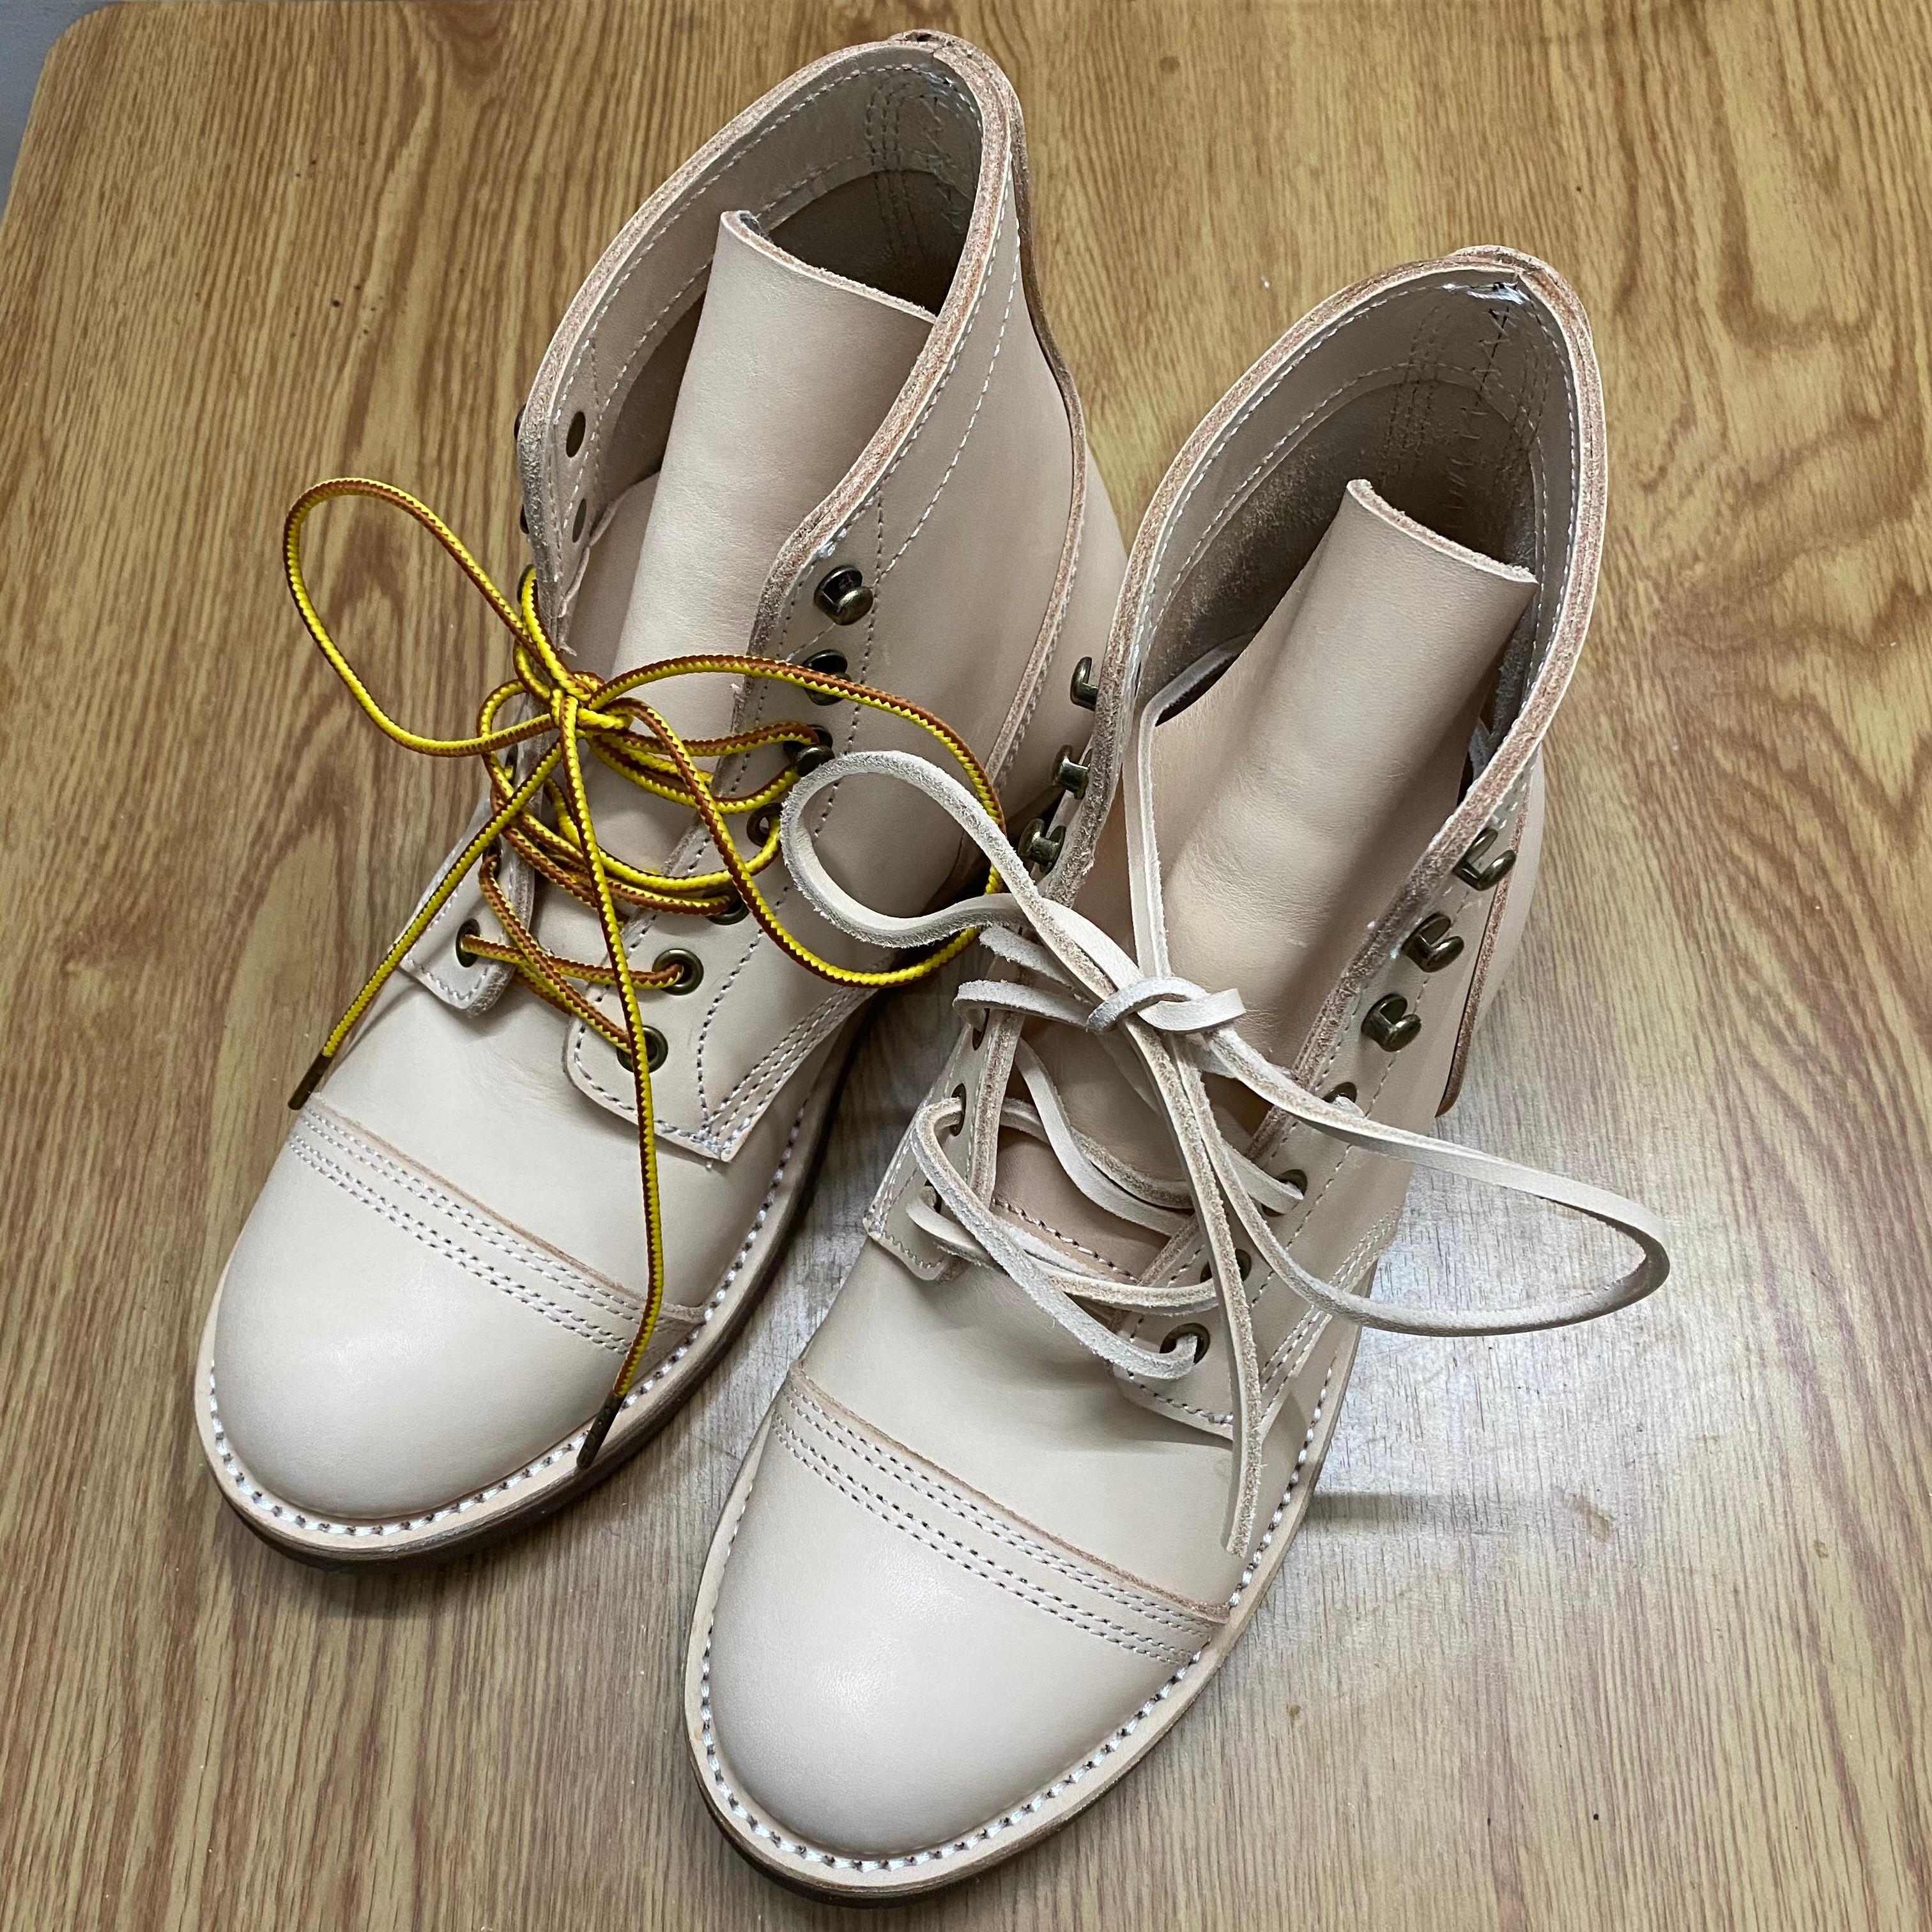 VT8111 RockCanRoll حجم 35-50 فائقة الجودة حقيقية الايطالية الخضار دباغة جلد البقر اليدوية جوديير Welted الأحذية